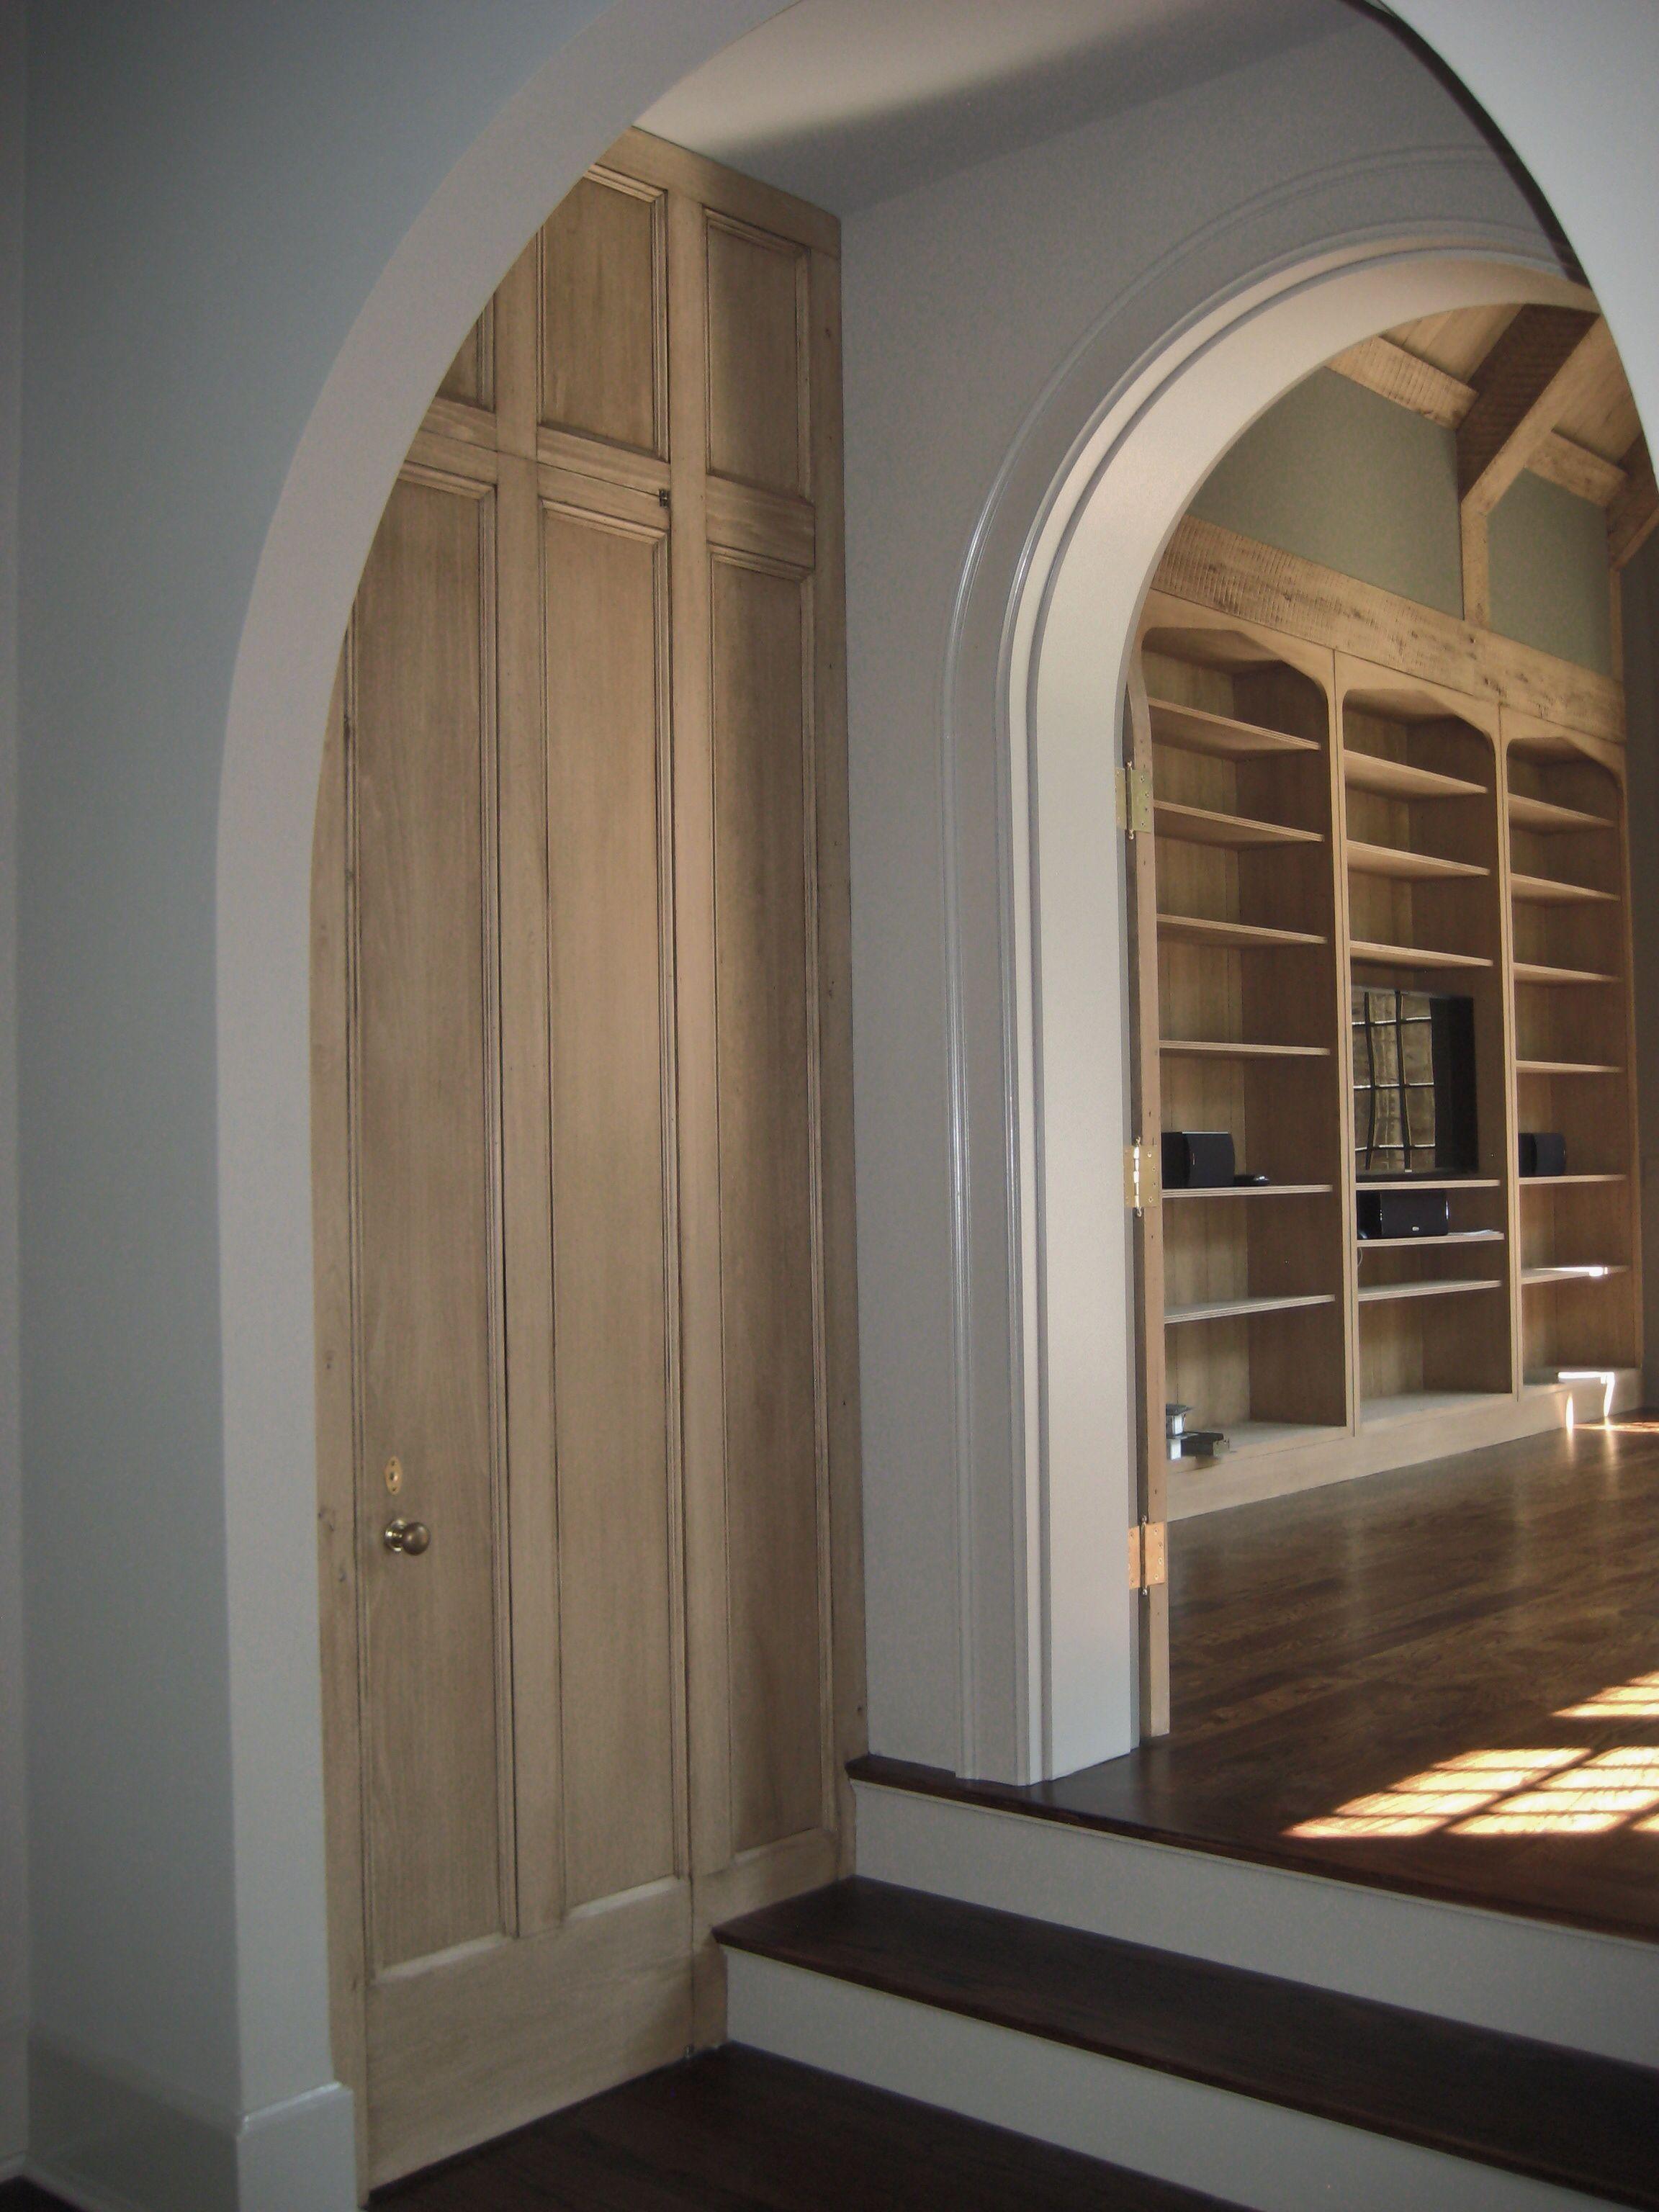 Paneled Powder Room Door Birmingham Alabama By Bill Ingram